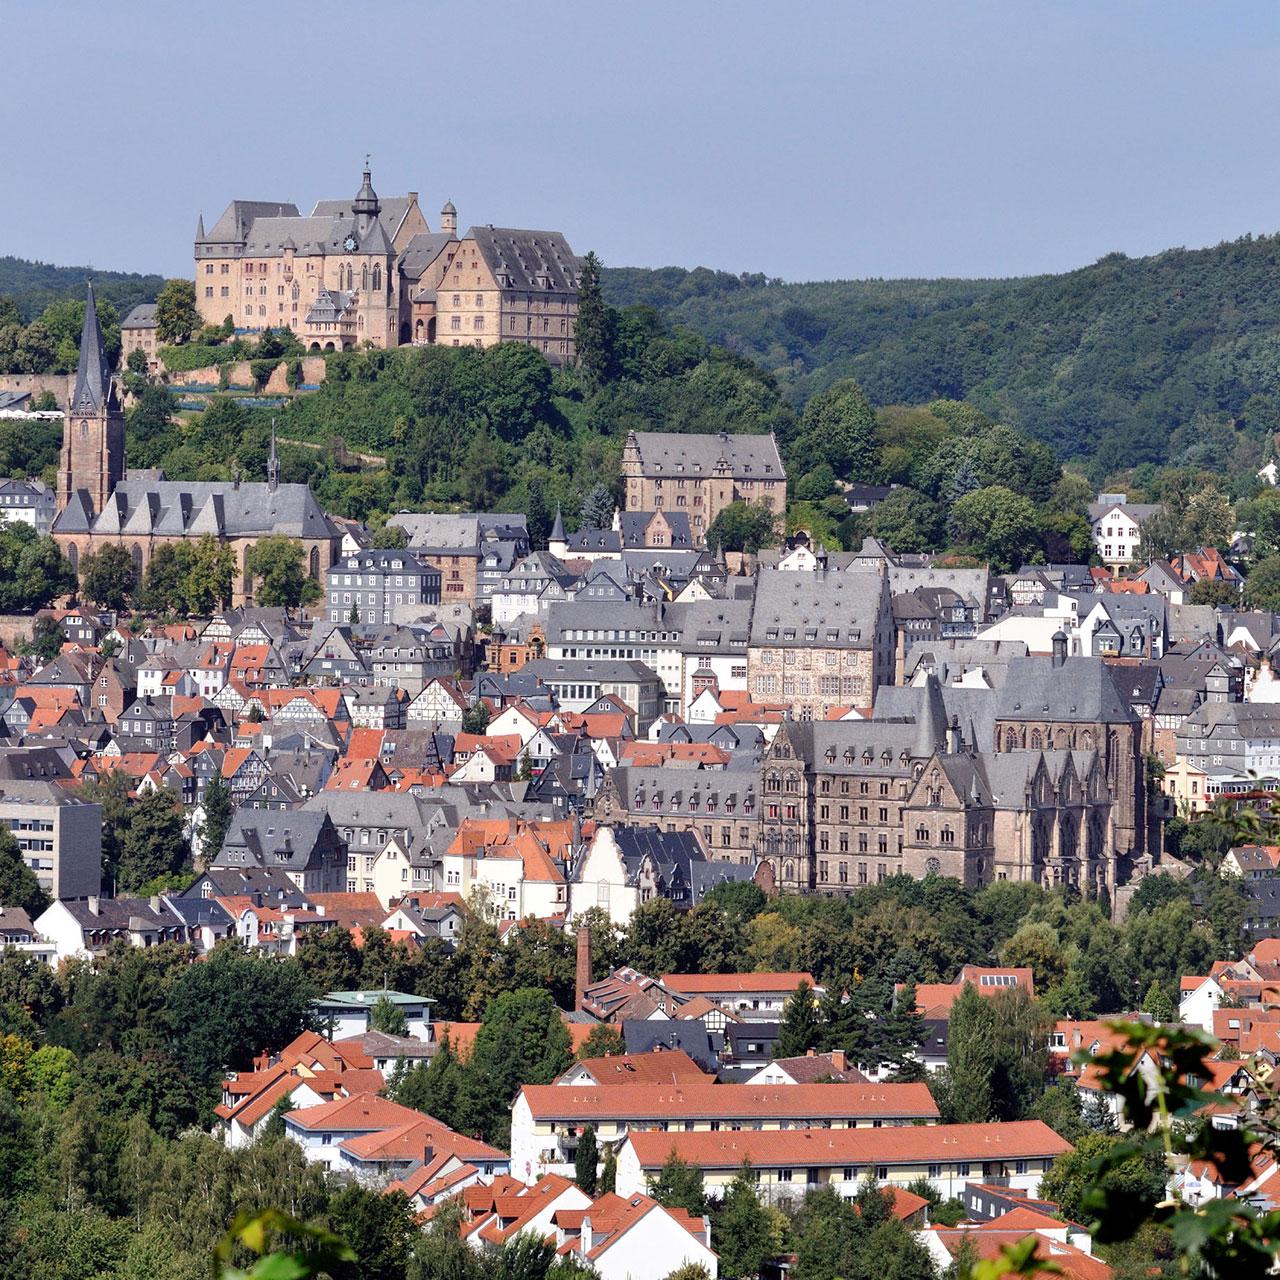 The newest member of the Carl Duisberg group of companies is the S + W speak + write gGmbH language school in Marburg